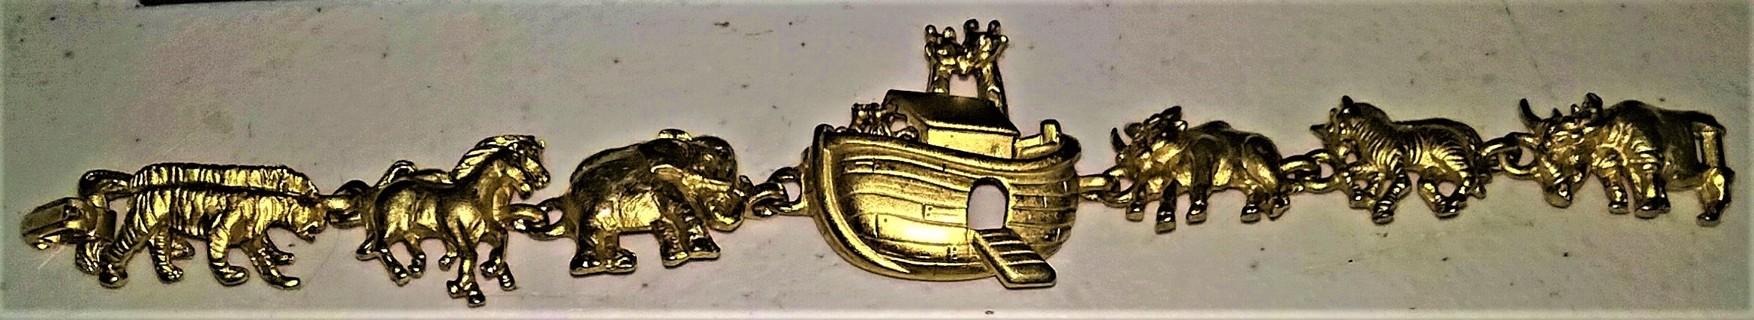 "Bronze Noah's Ark charm bracelet by A.J.C. - 7"" long"